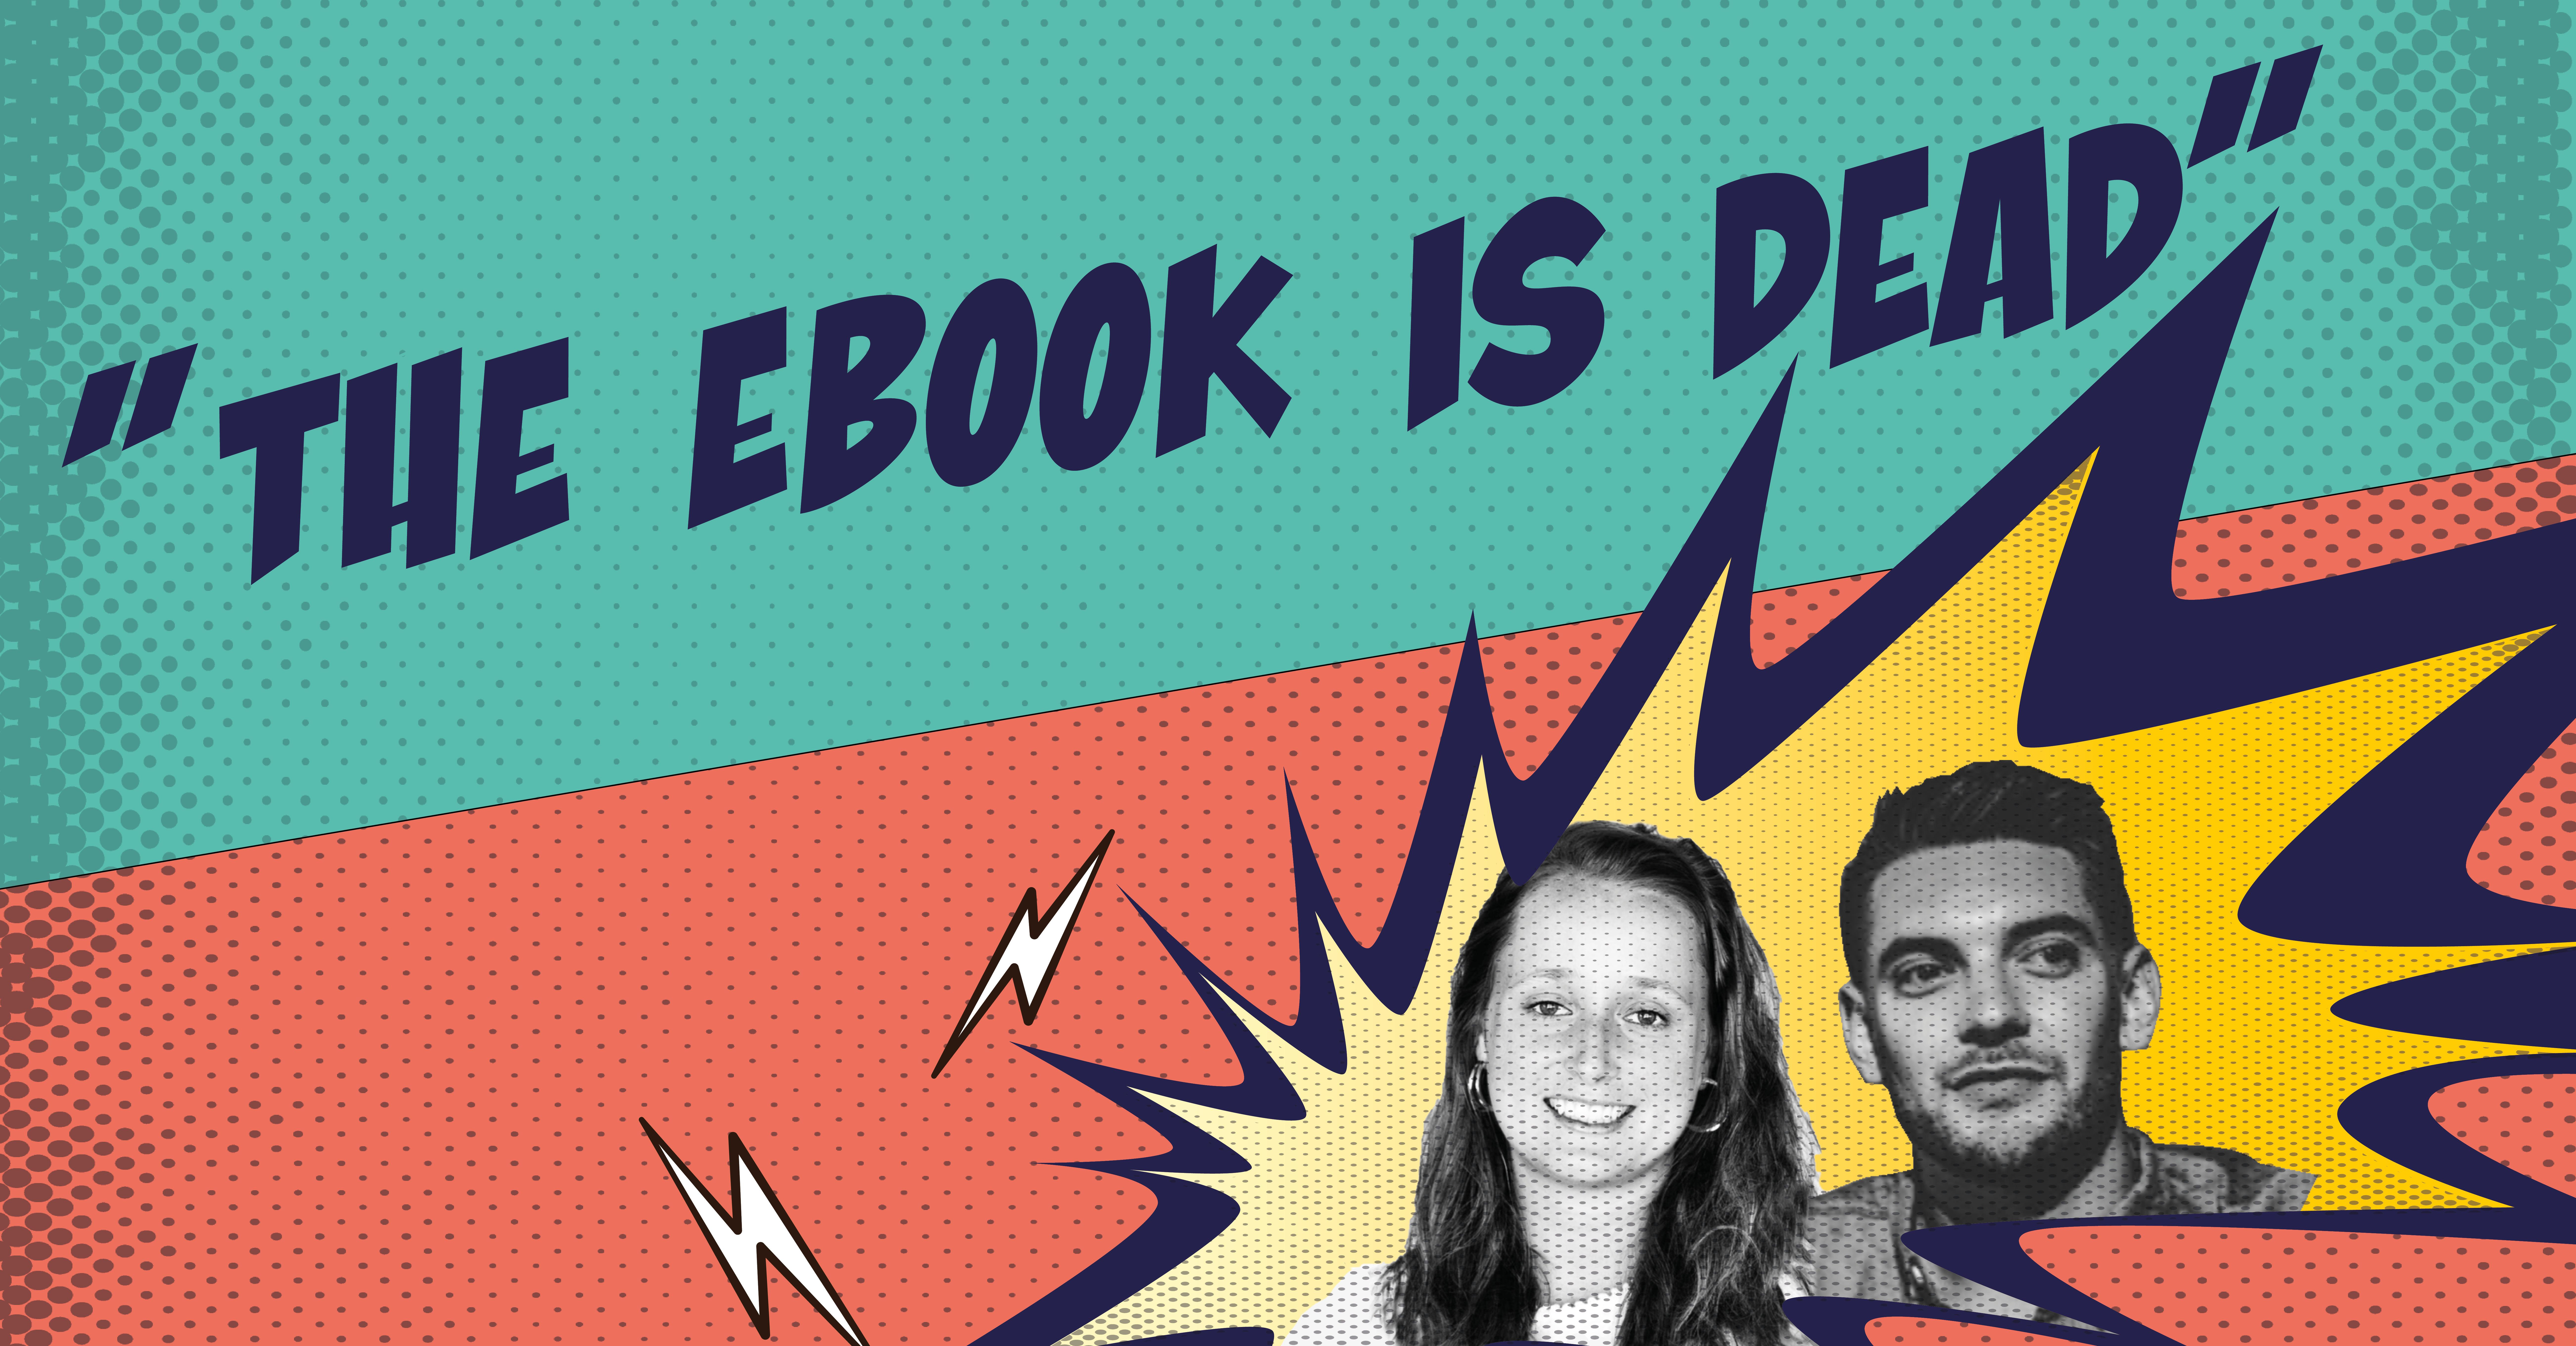 Landing Page Header - eBook is dead 2